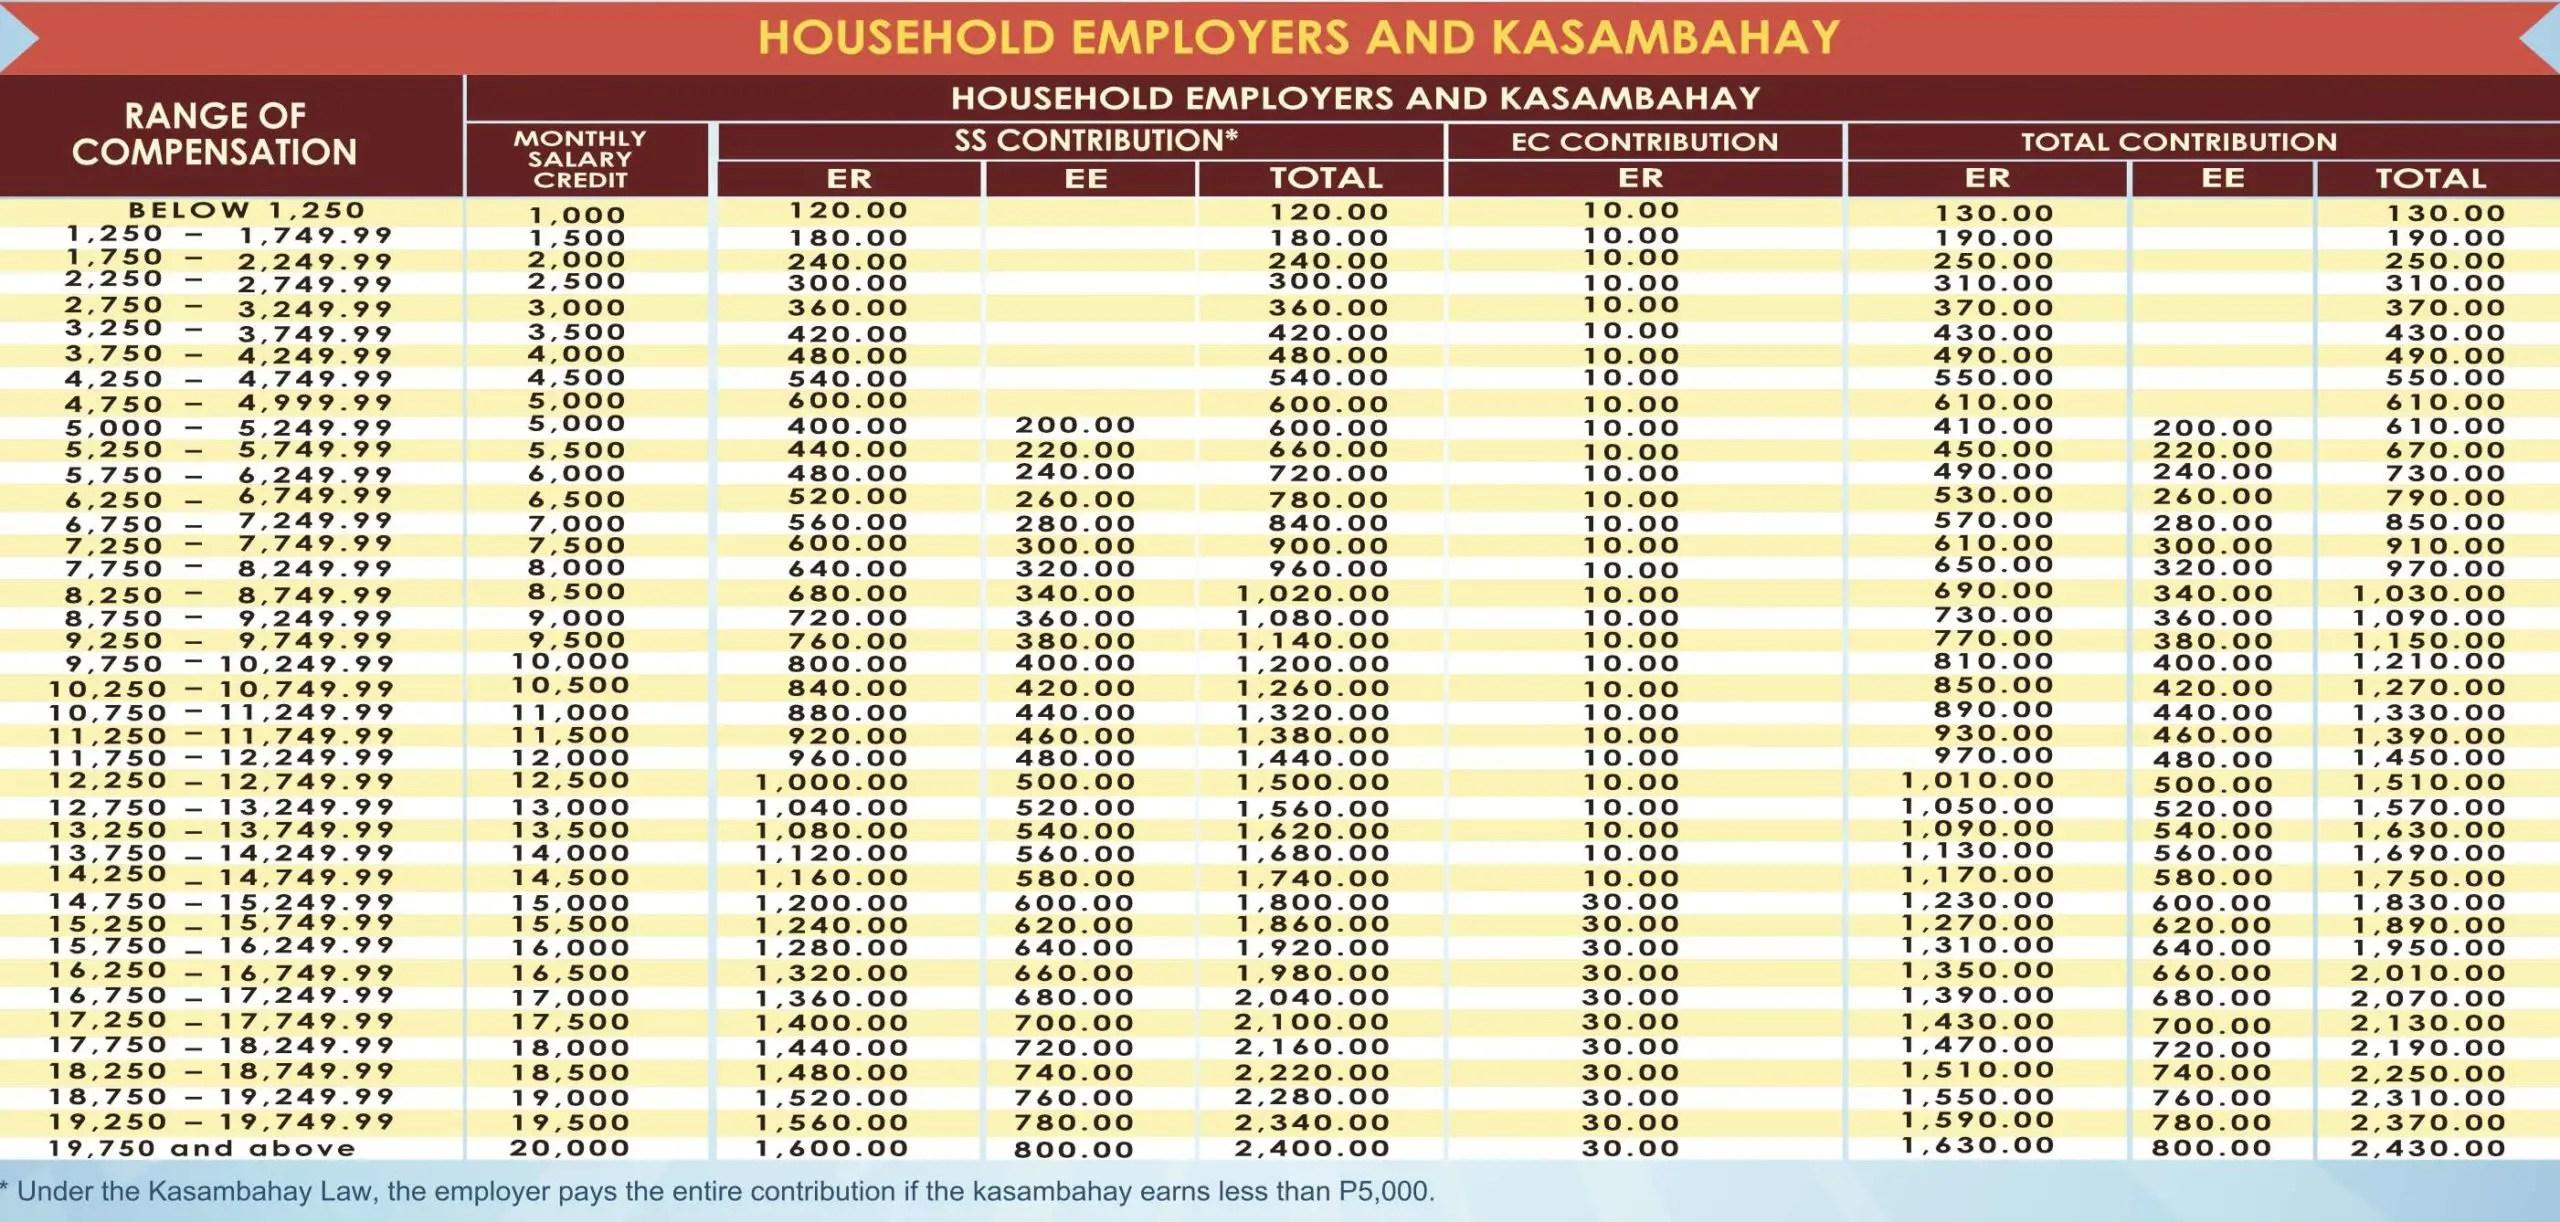 sss amount for household employers kasambahay